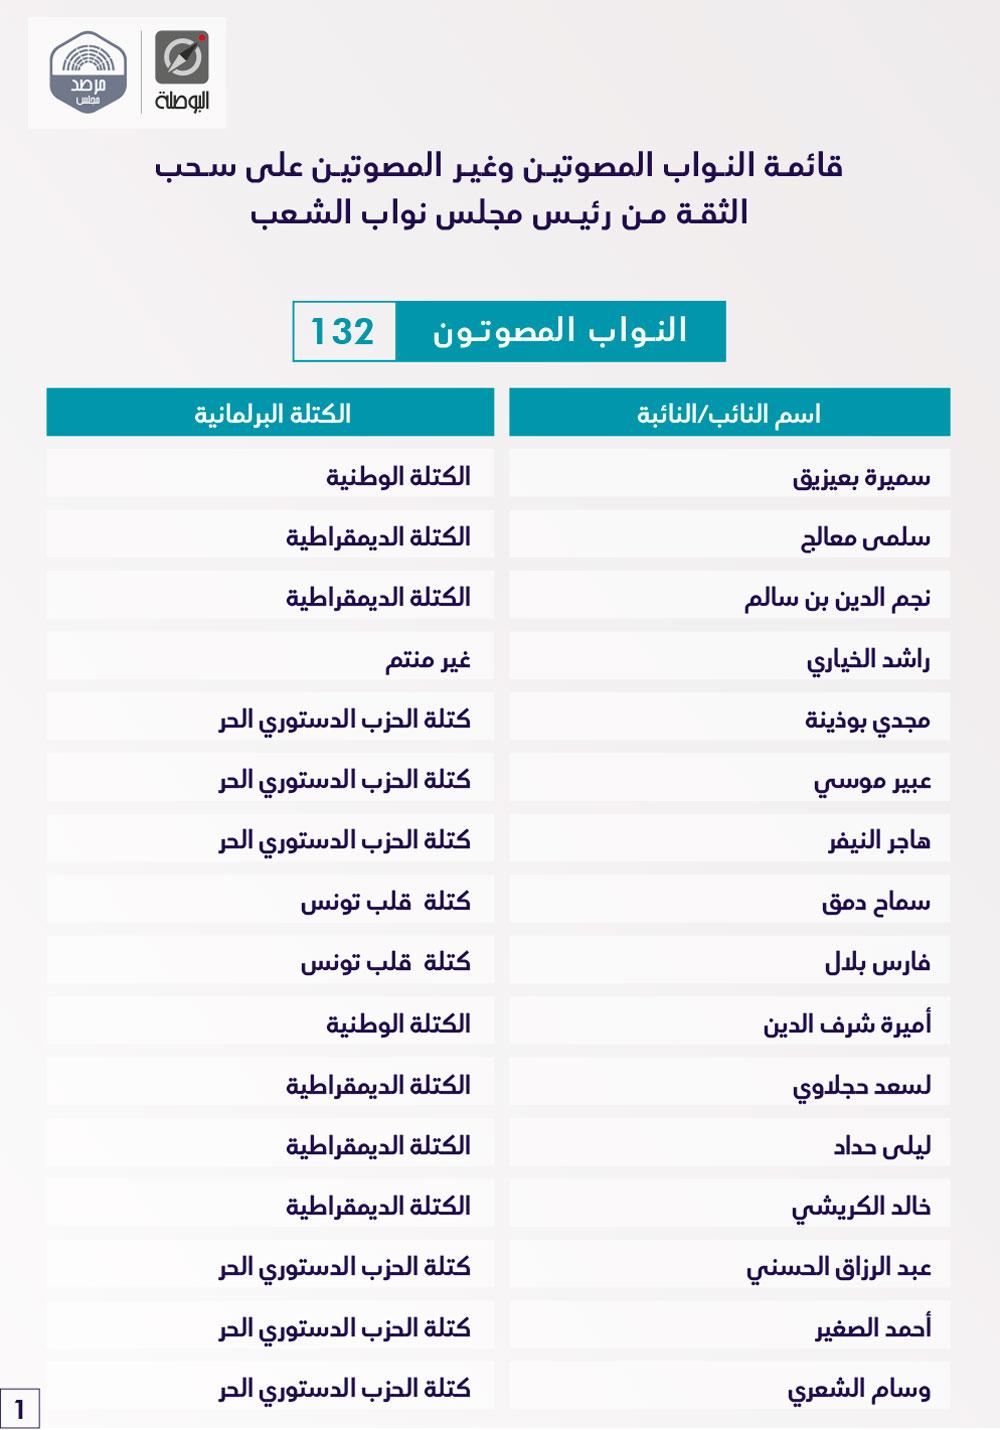 vote-bawsala-300720--1.jpg